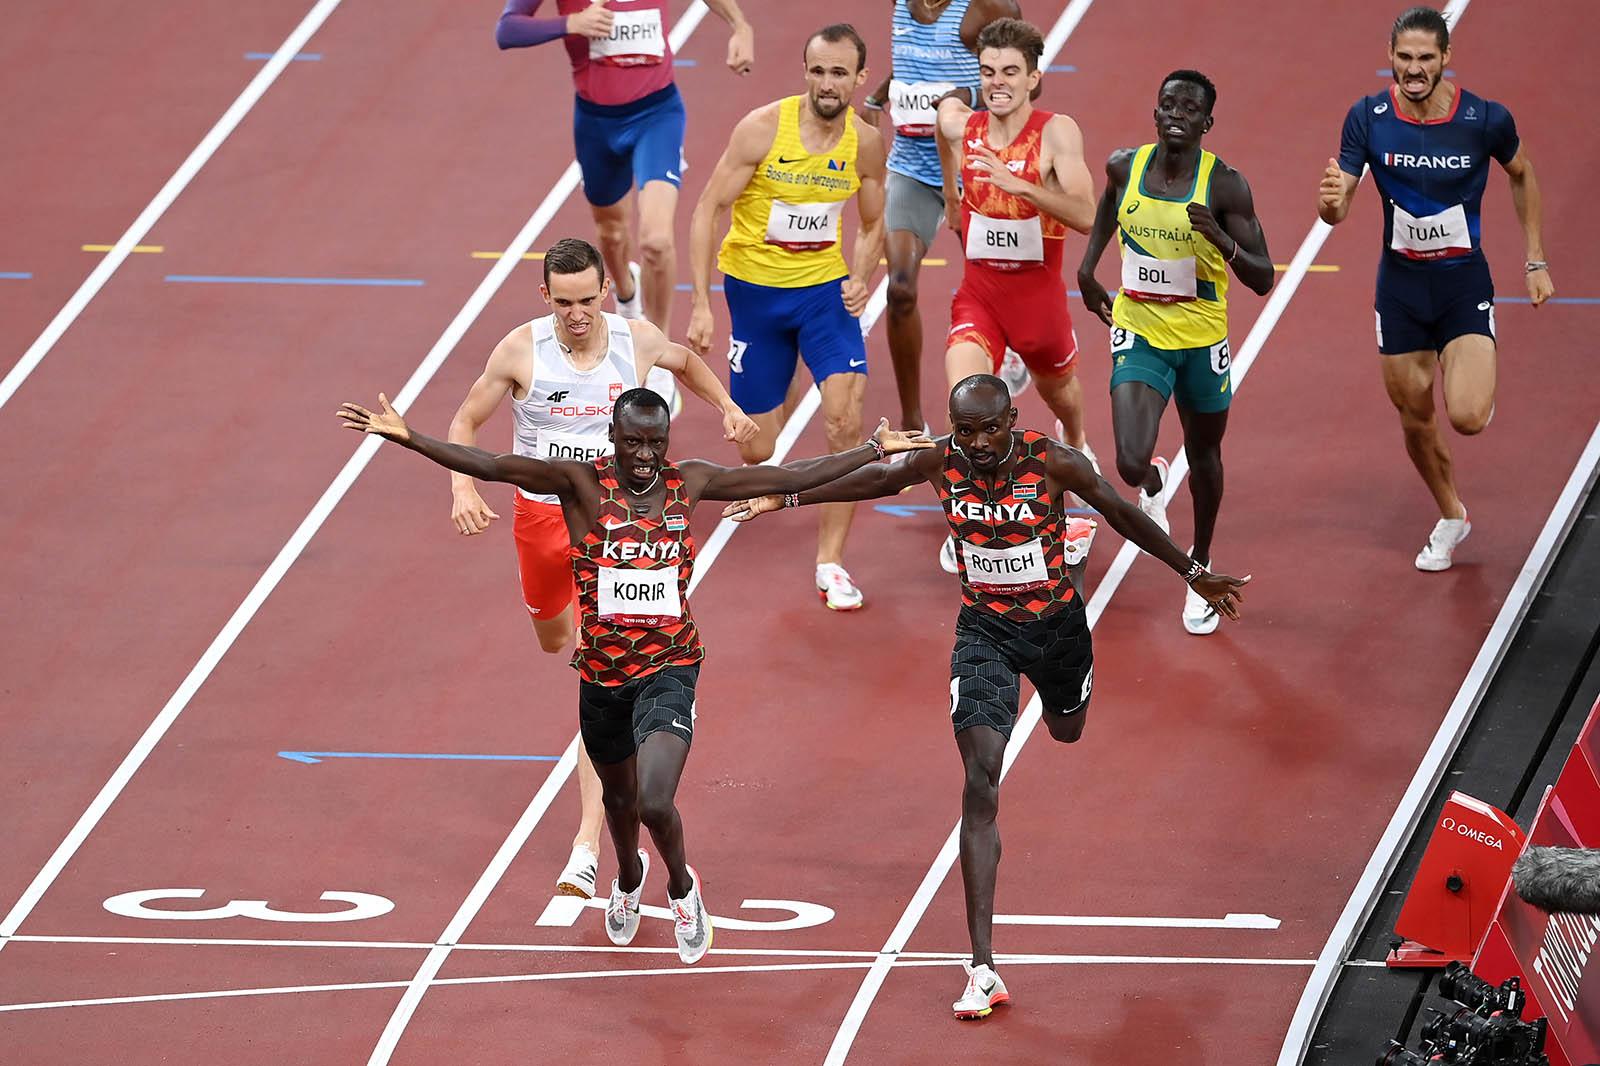 Emmanuel Korir of Kenya crosses the finish line alongside fellow Kenyan Ferguson Cheruiyot Rotichin the men's 800m final on August 4.